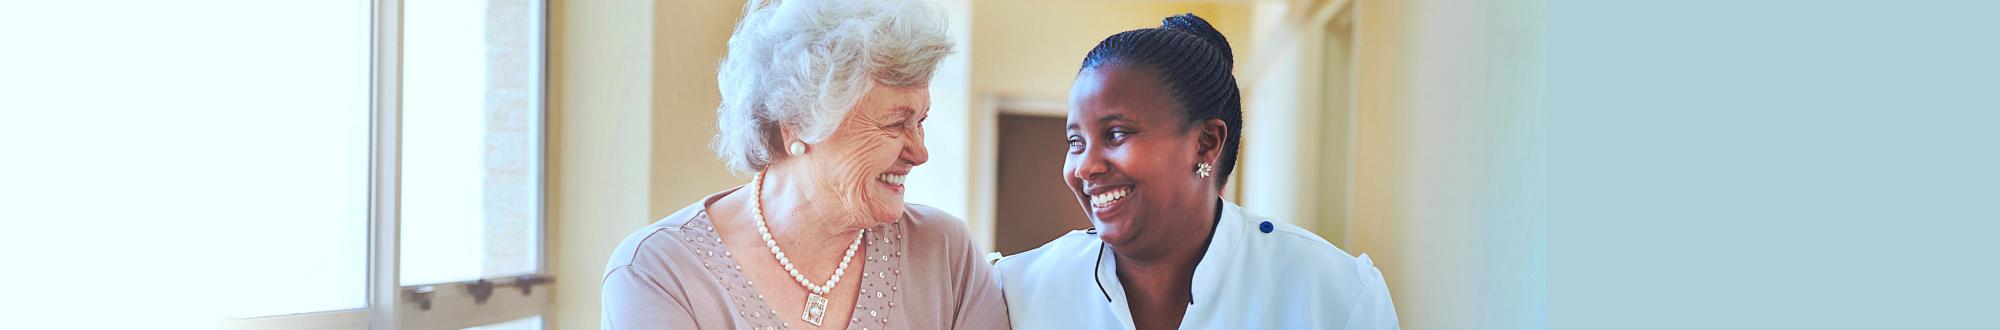 Portrait of smiling home caregiver and senior women walking together